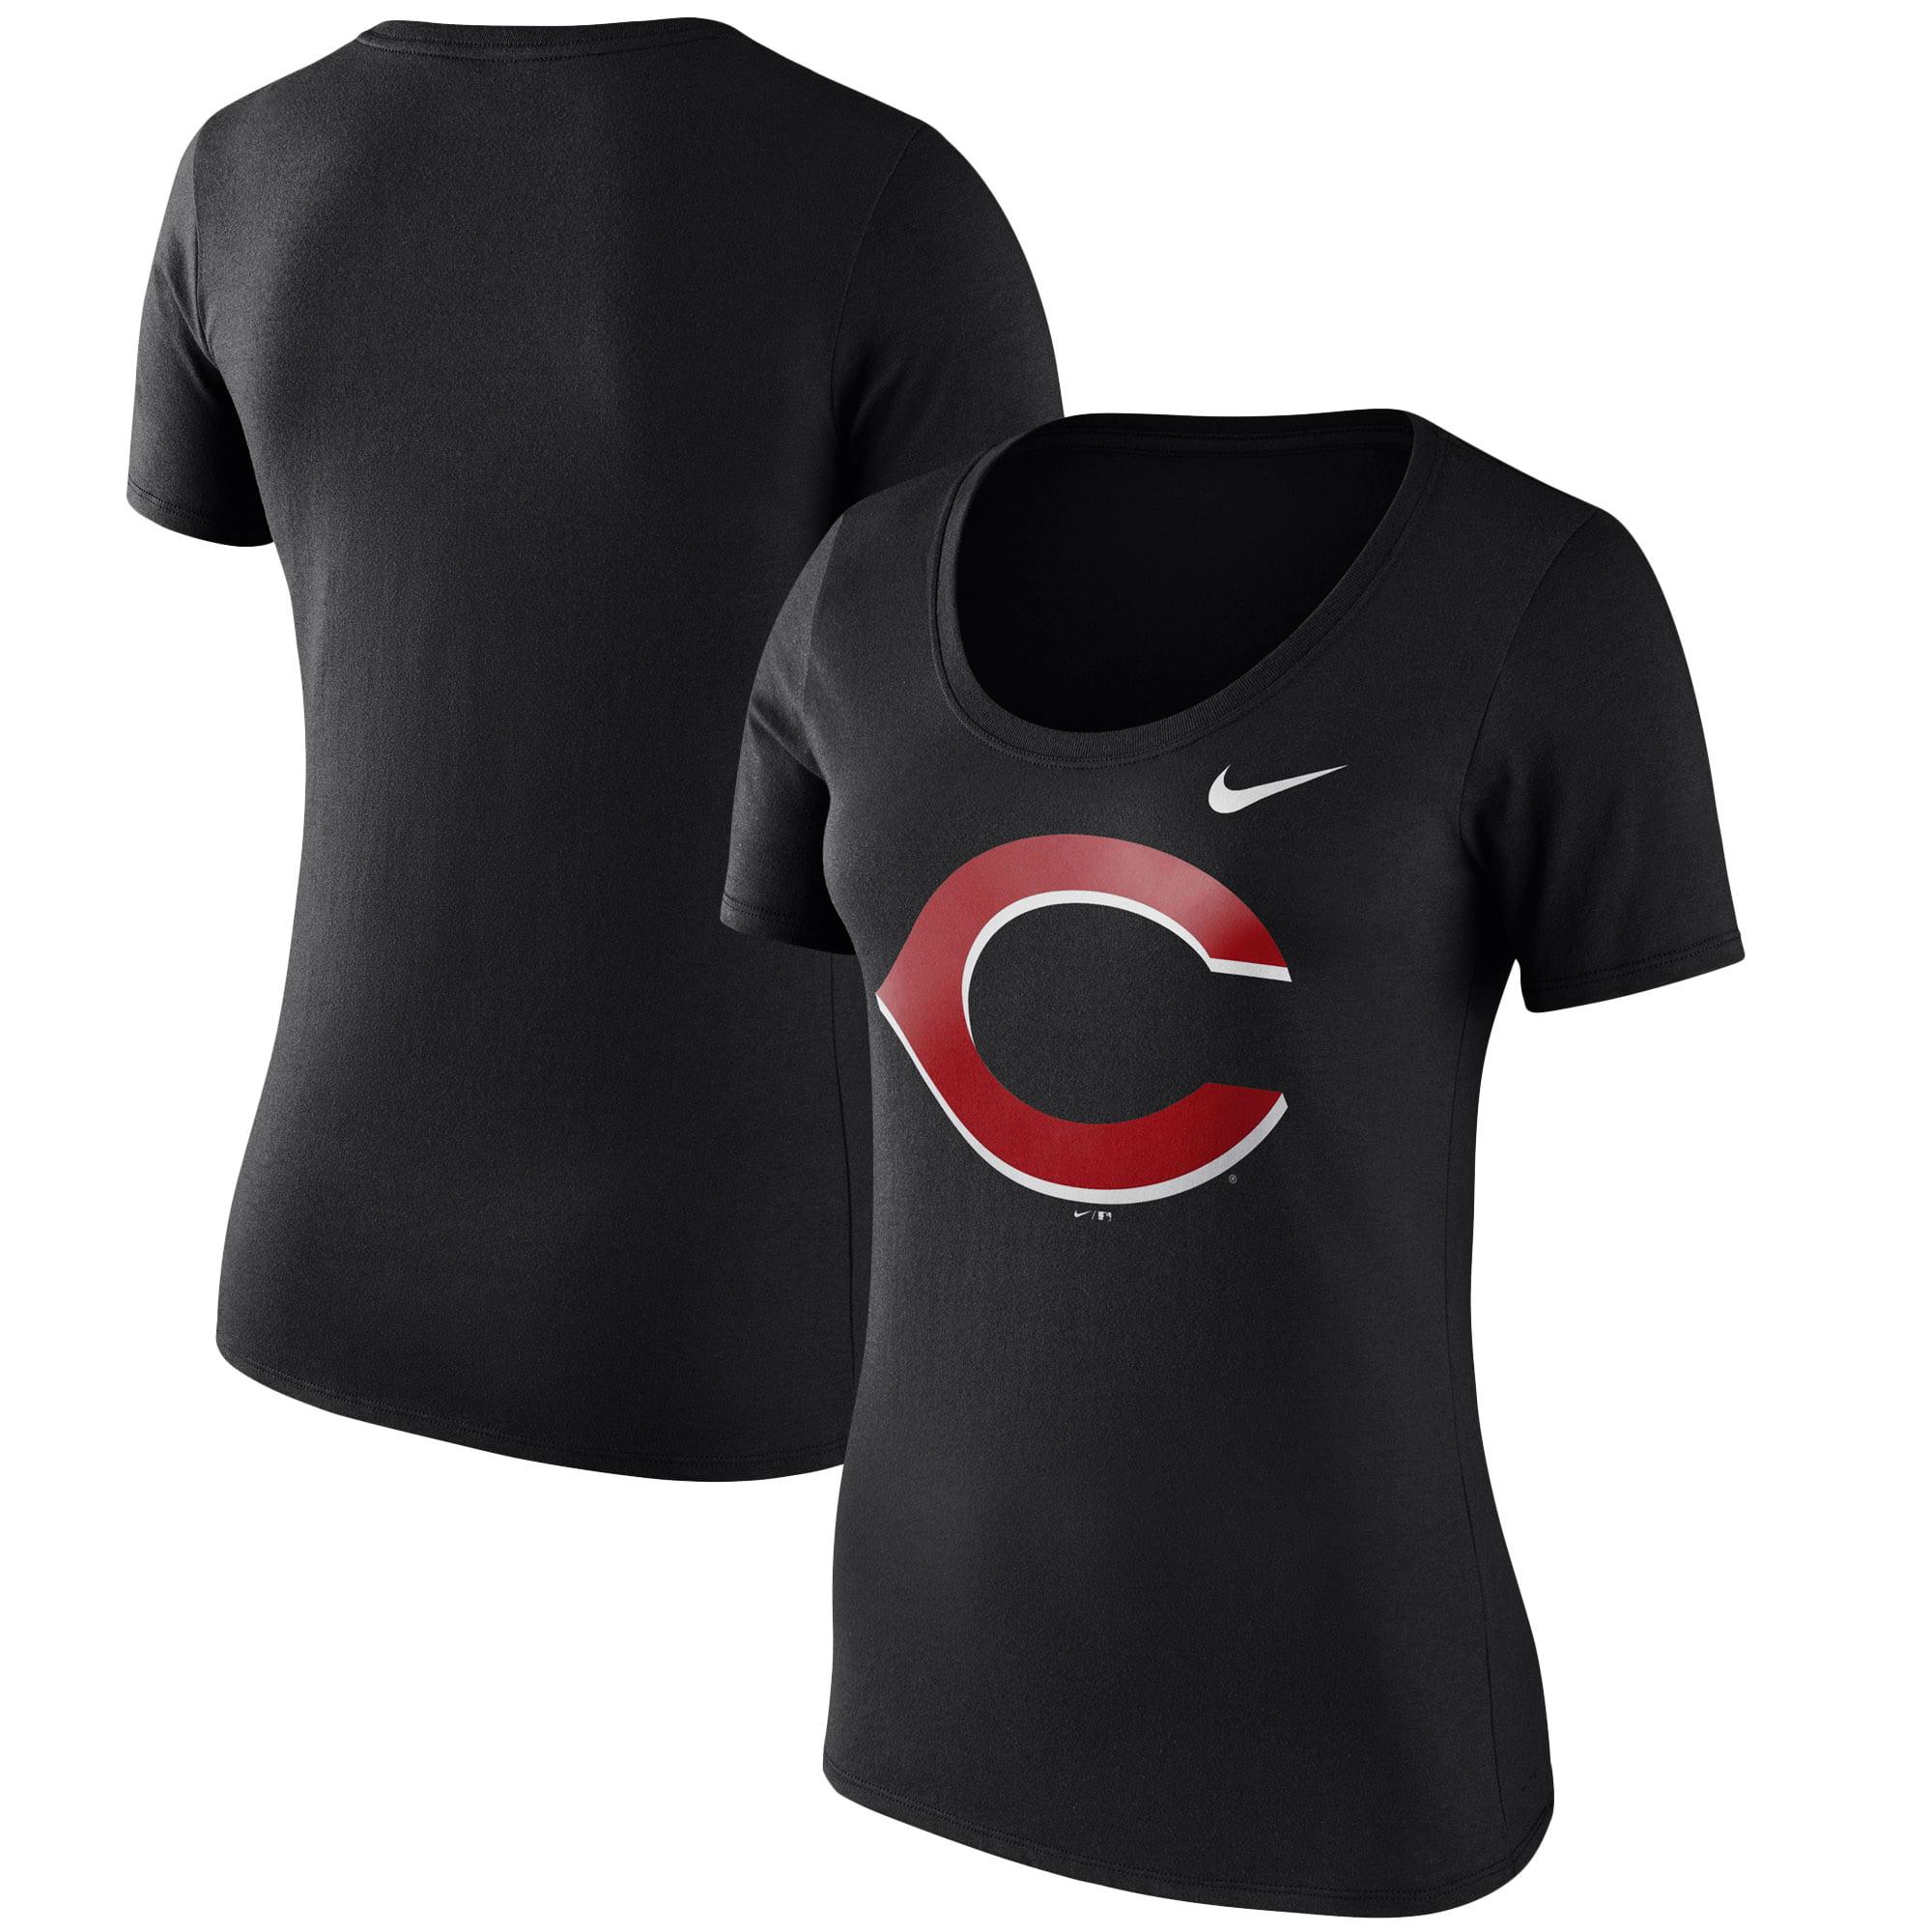 Women's Nike Black Cincinnati Reds Logo Scoop Neck T-Shirt